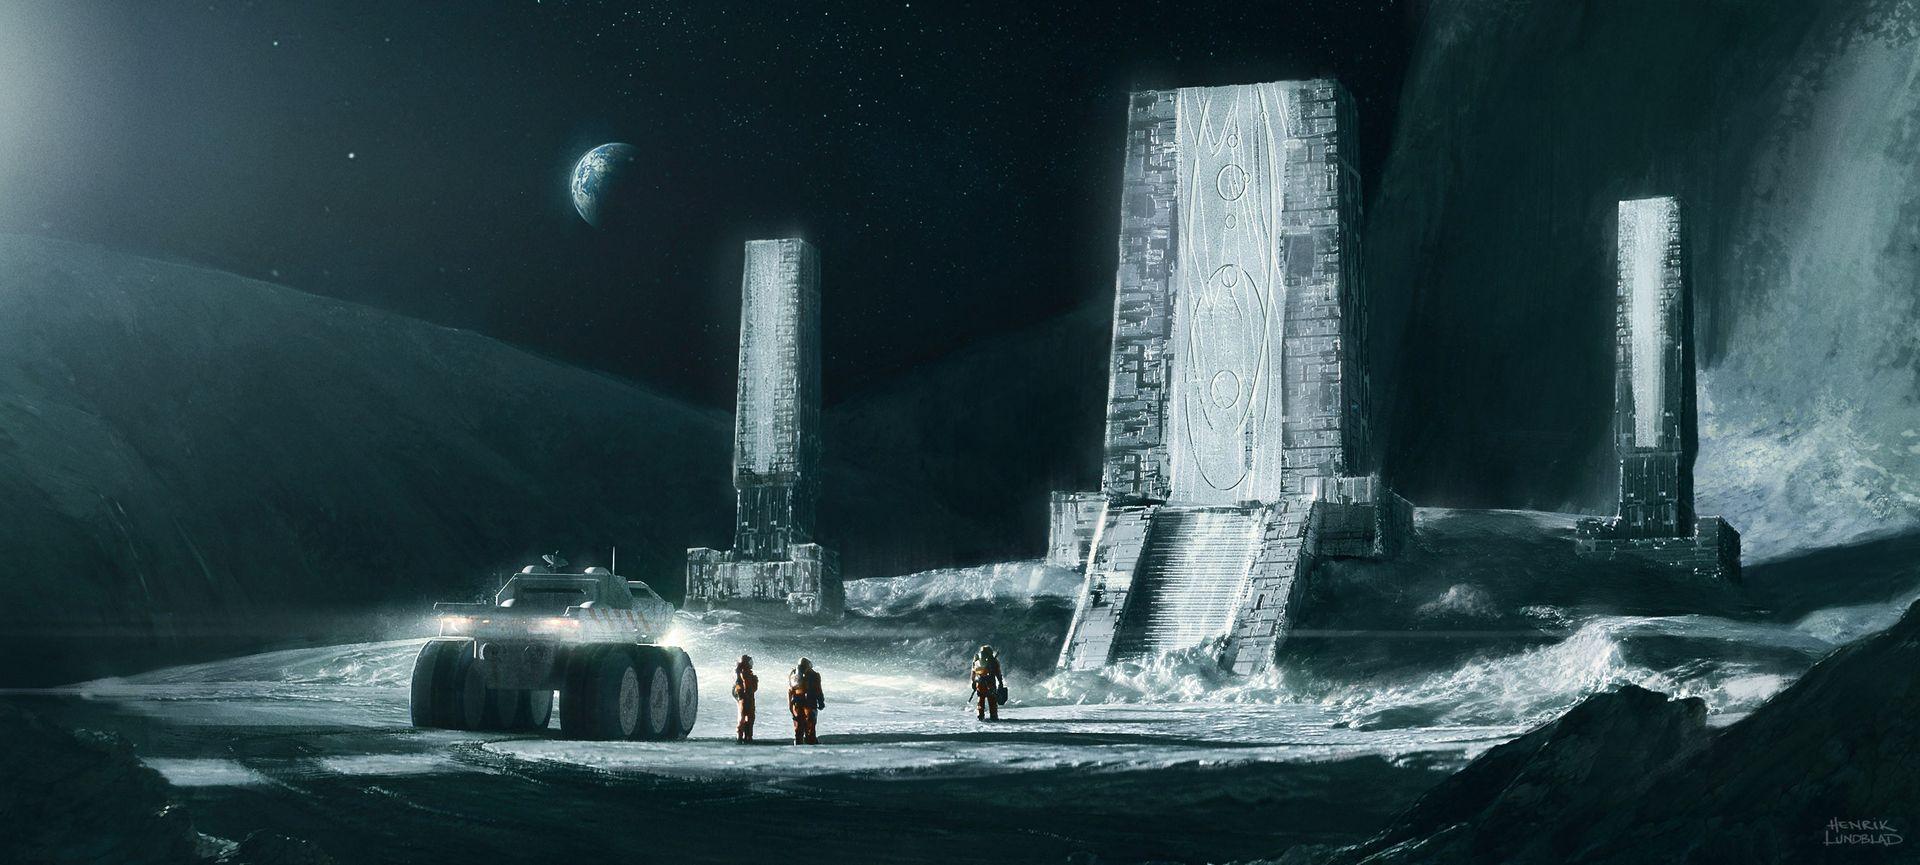 moon-temple-by-henrik-lundblad-bboag342jx-1920x865.jpg